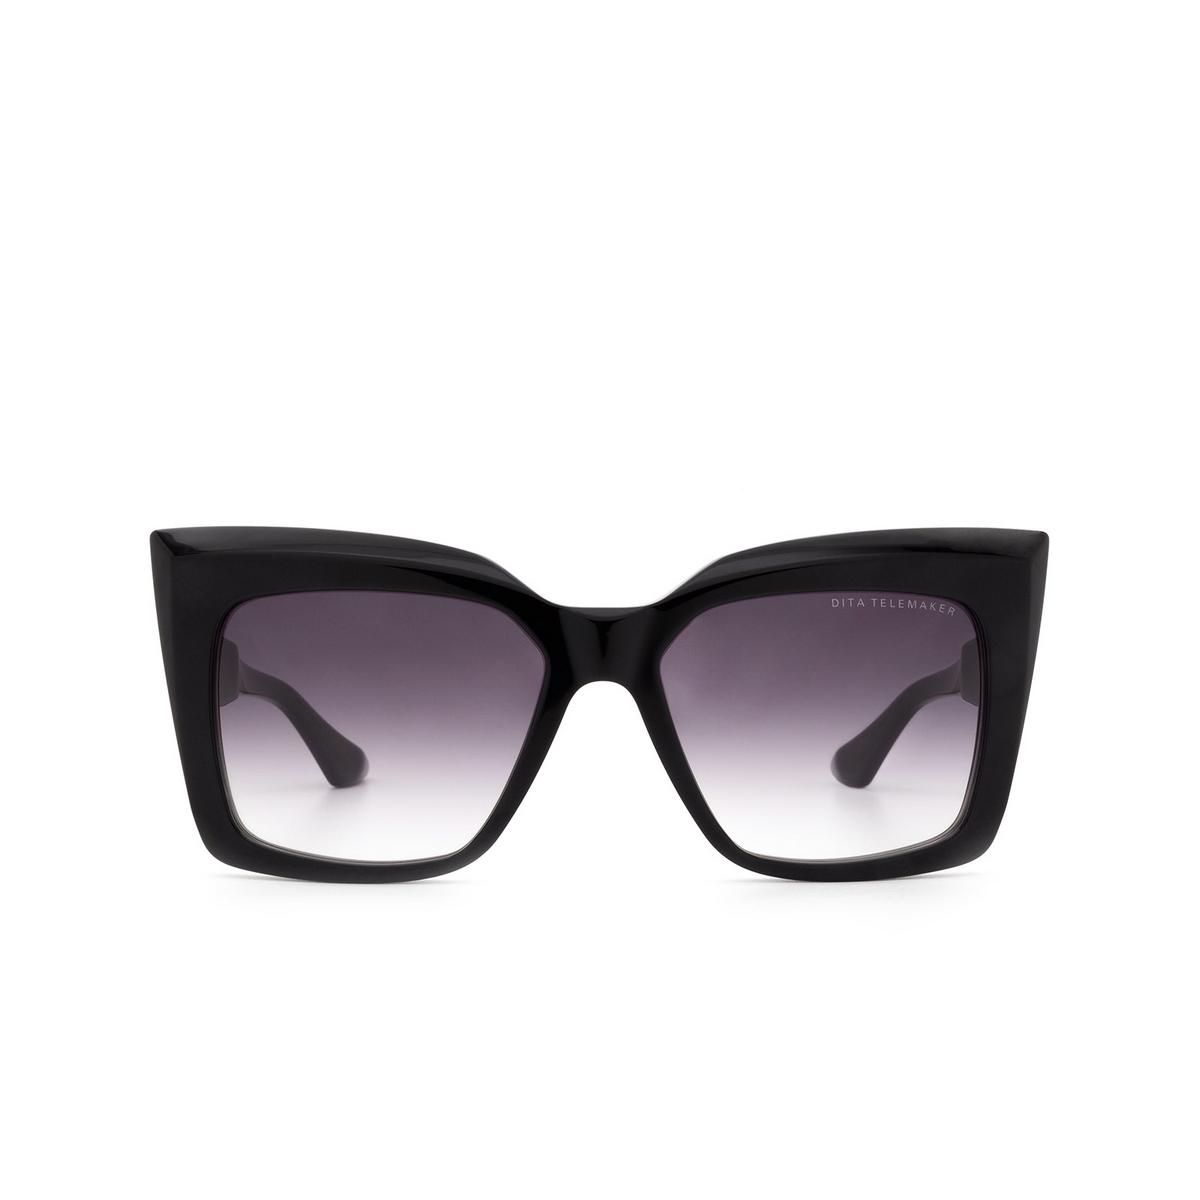 Dita® Butterfly Sunglasses: Telemaker DTS704-A-01-Z color Black Blk.